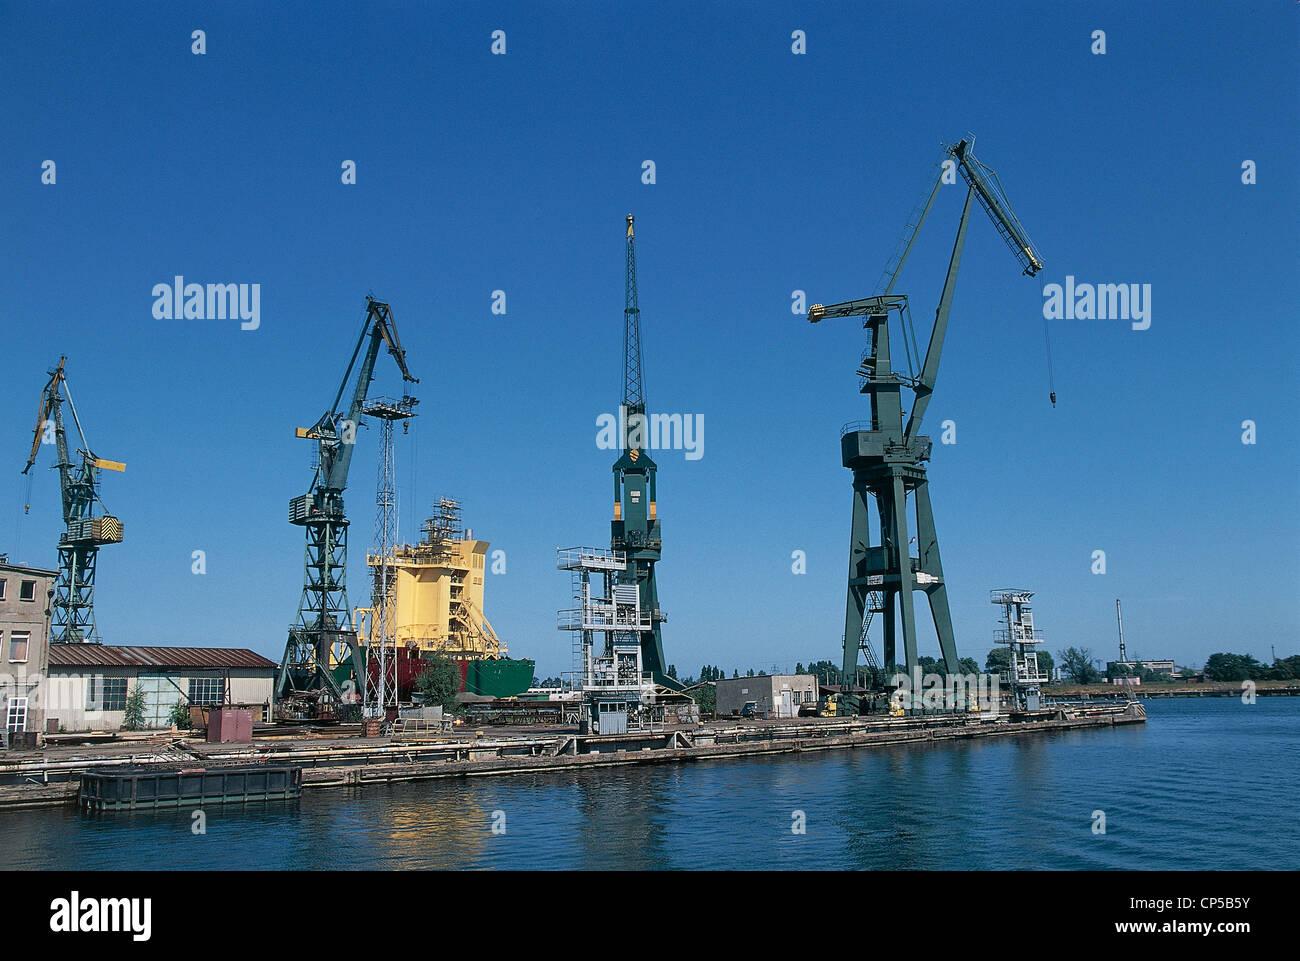 Poland - Pomerania - Gdansk - Ports on the river Motlawa. - Stock Image